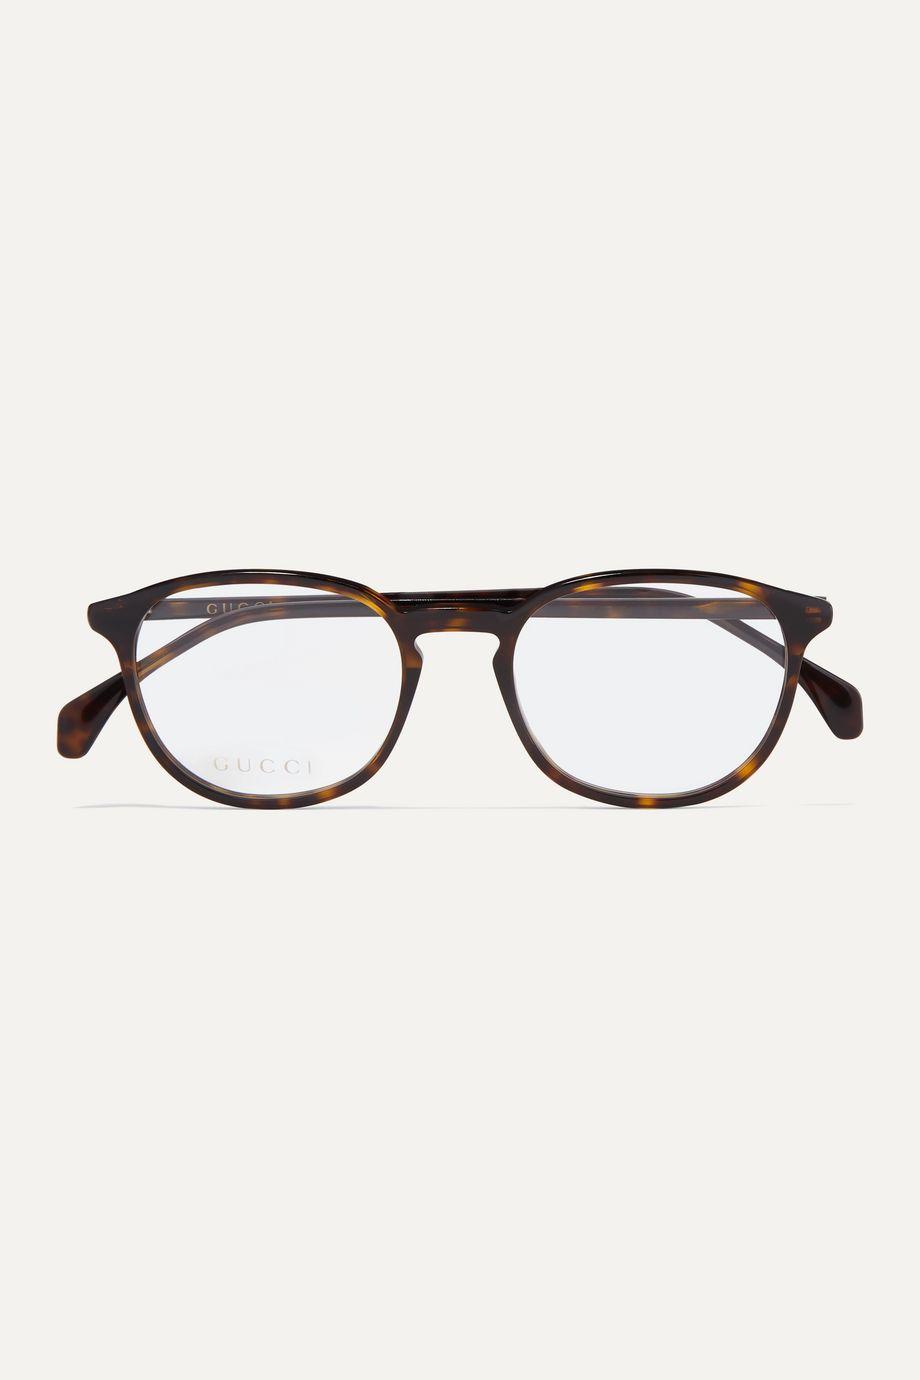 Gucci Round-frame tortoiseshell acetate optical glasses